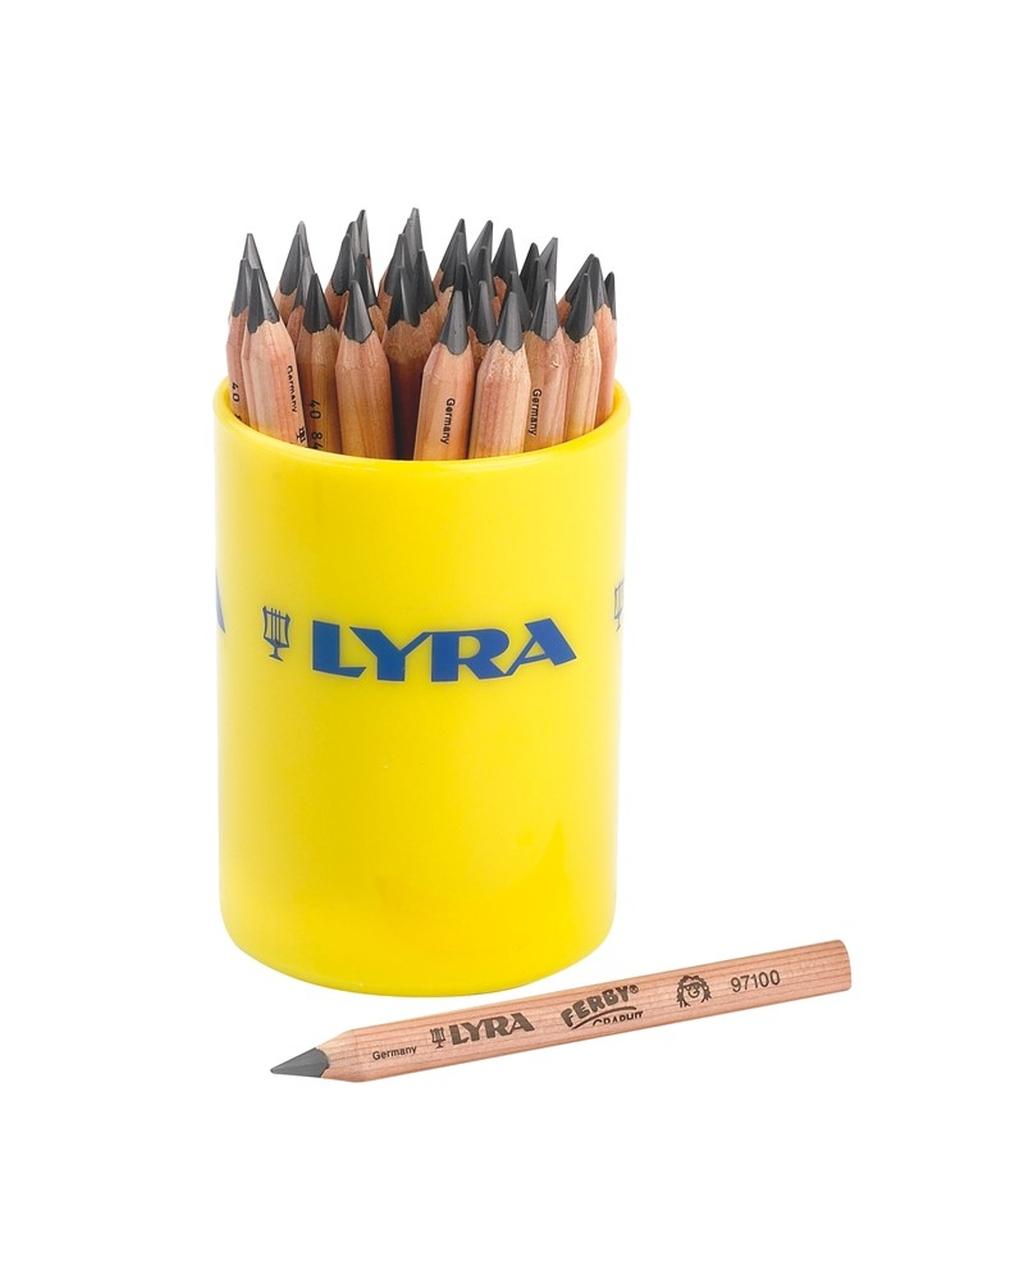 Lyra Ferby Graphite Pencils